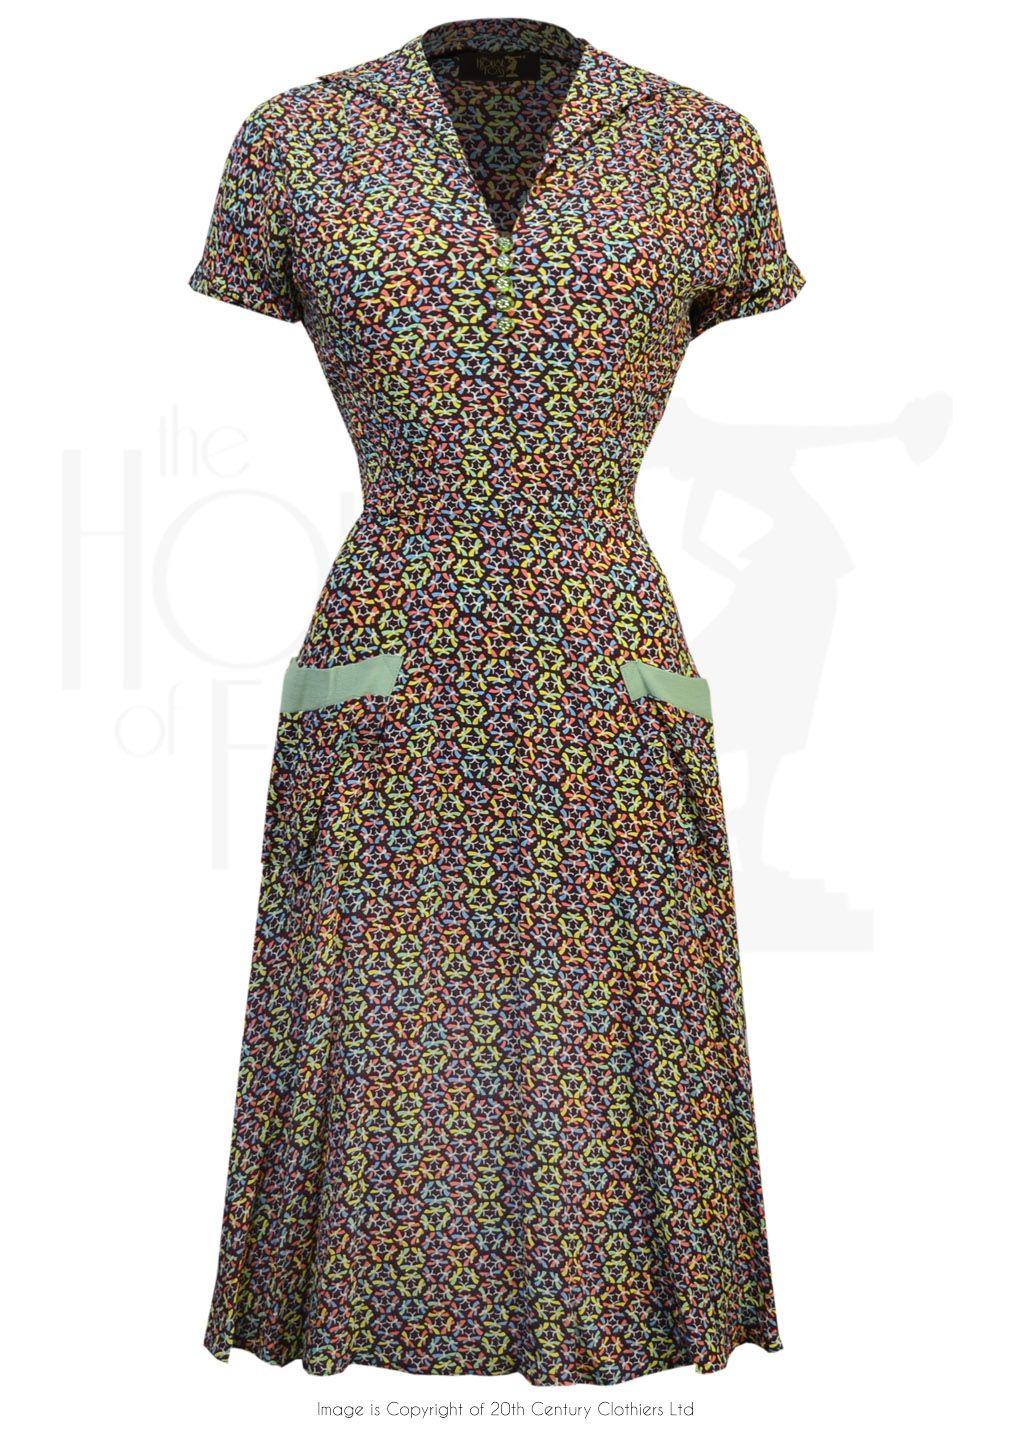 Late 1940s butterfly print wrap dress